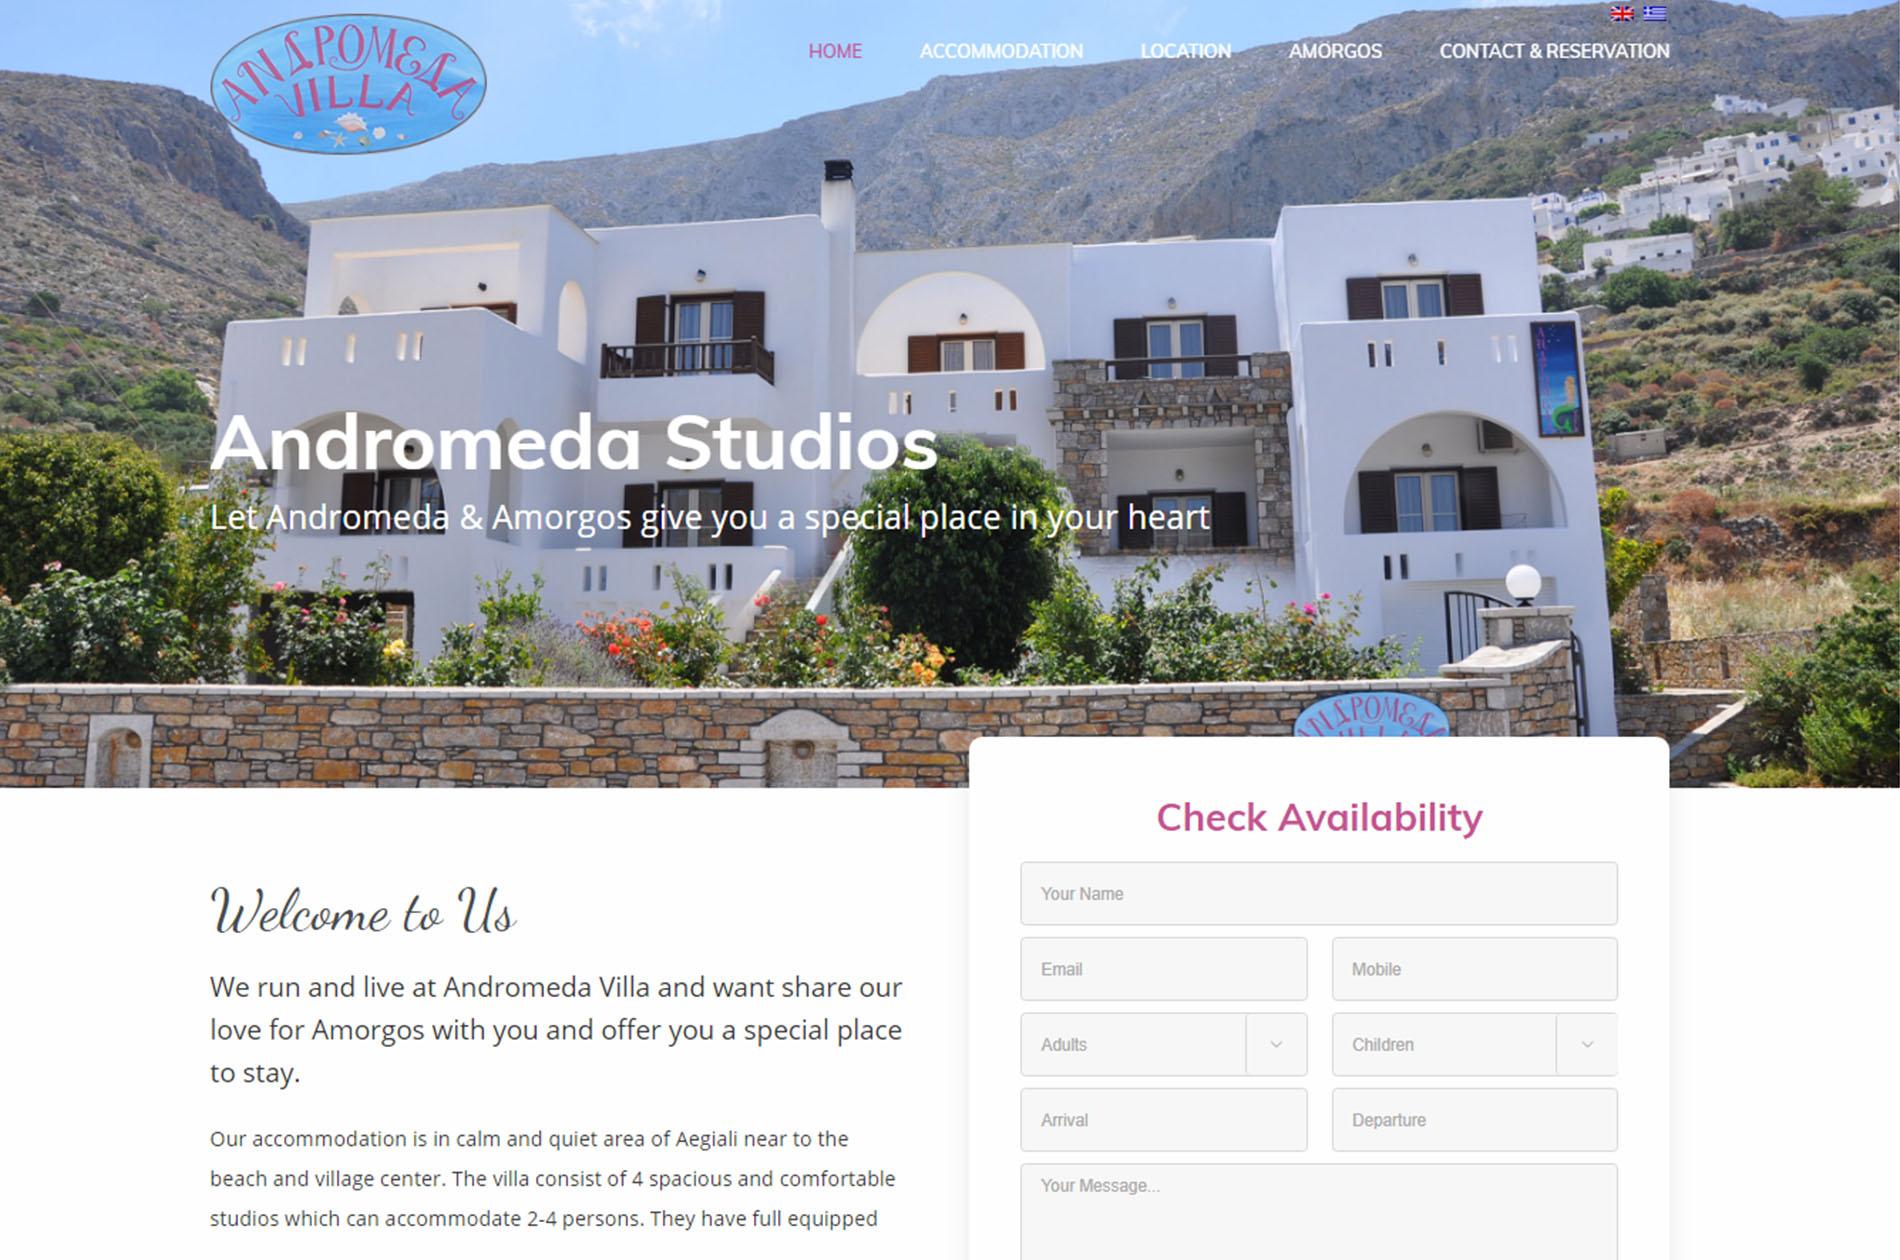 Andromeda Studios Amorgos Web Design